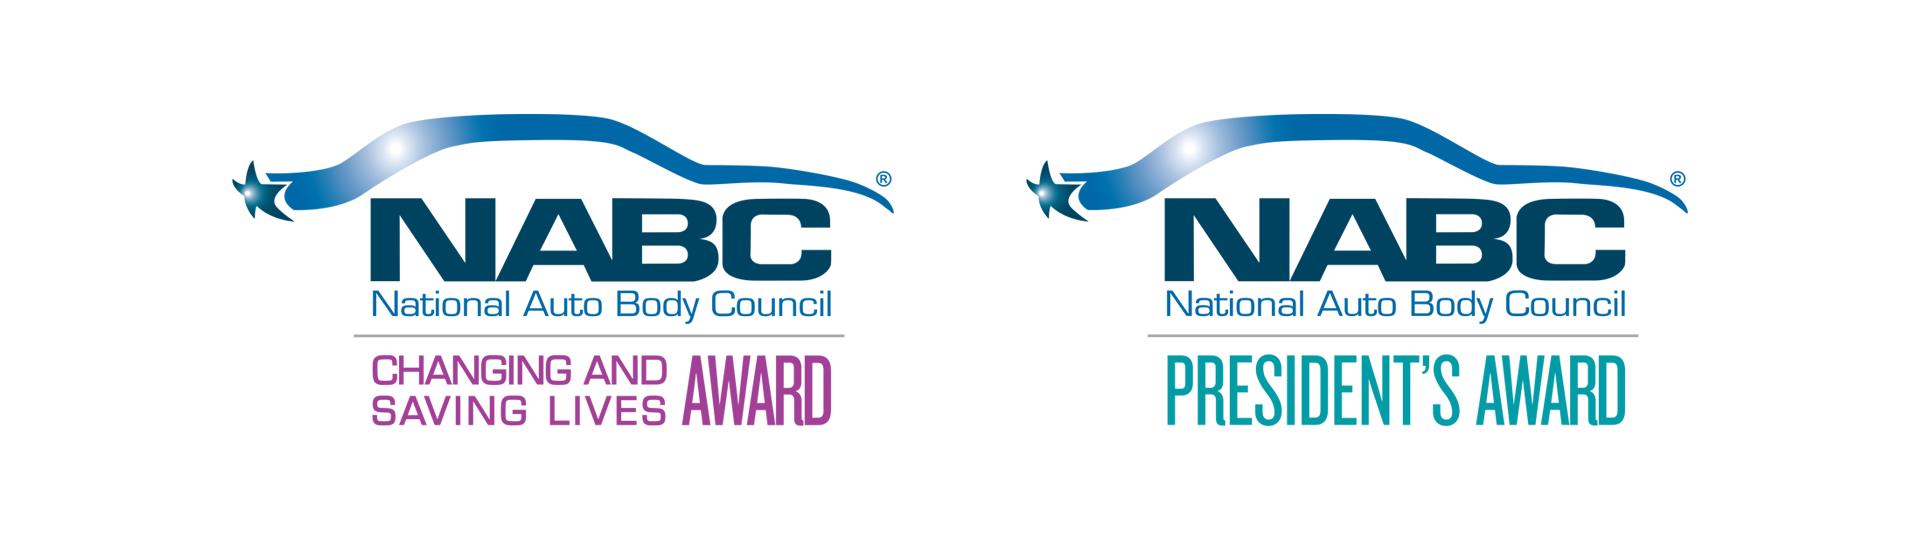 NABC Awards Logos